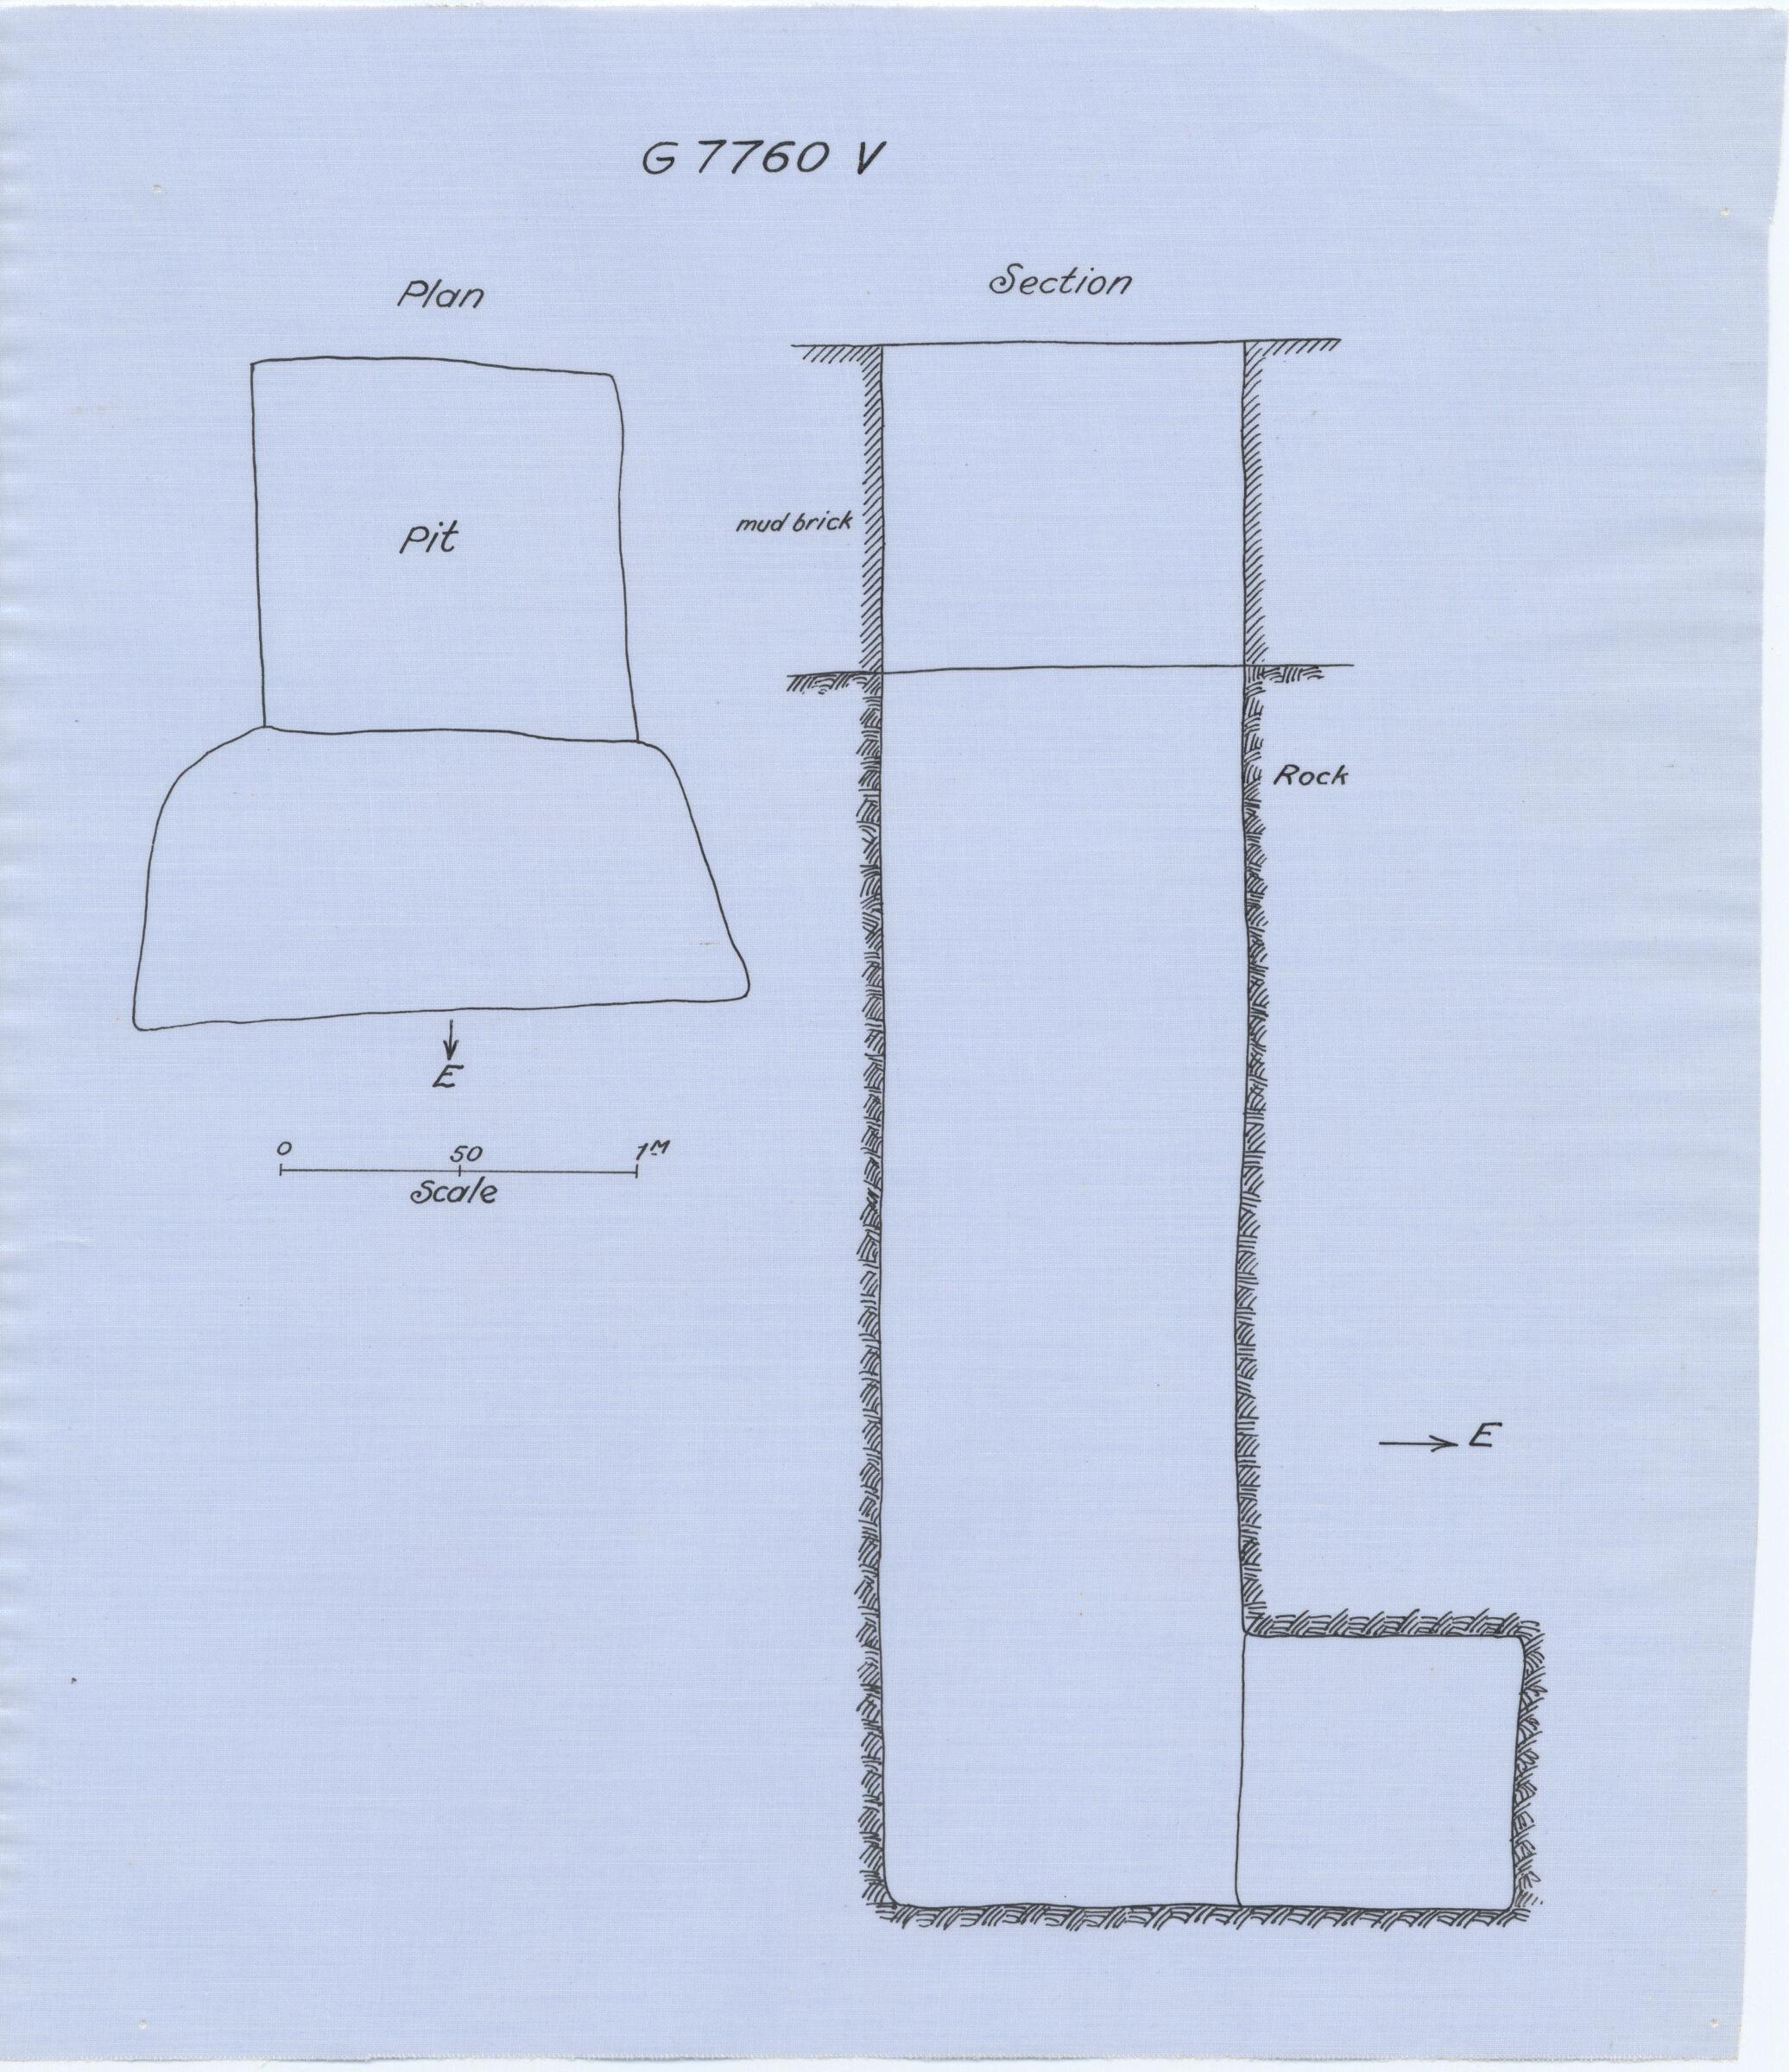 Maps and plans: G 7760, Shaft V